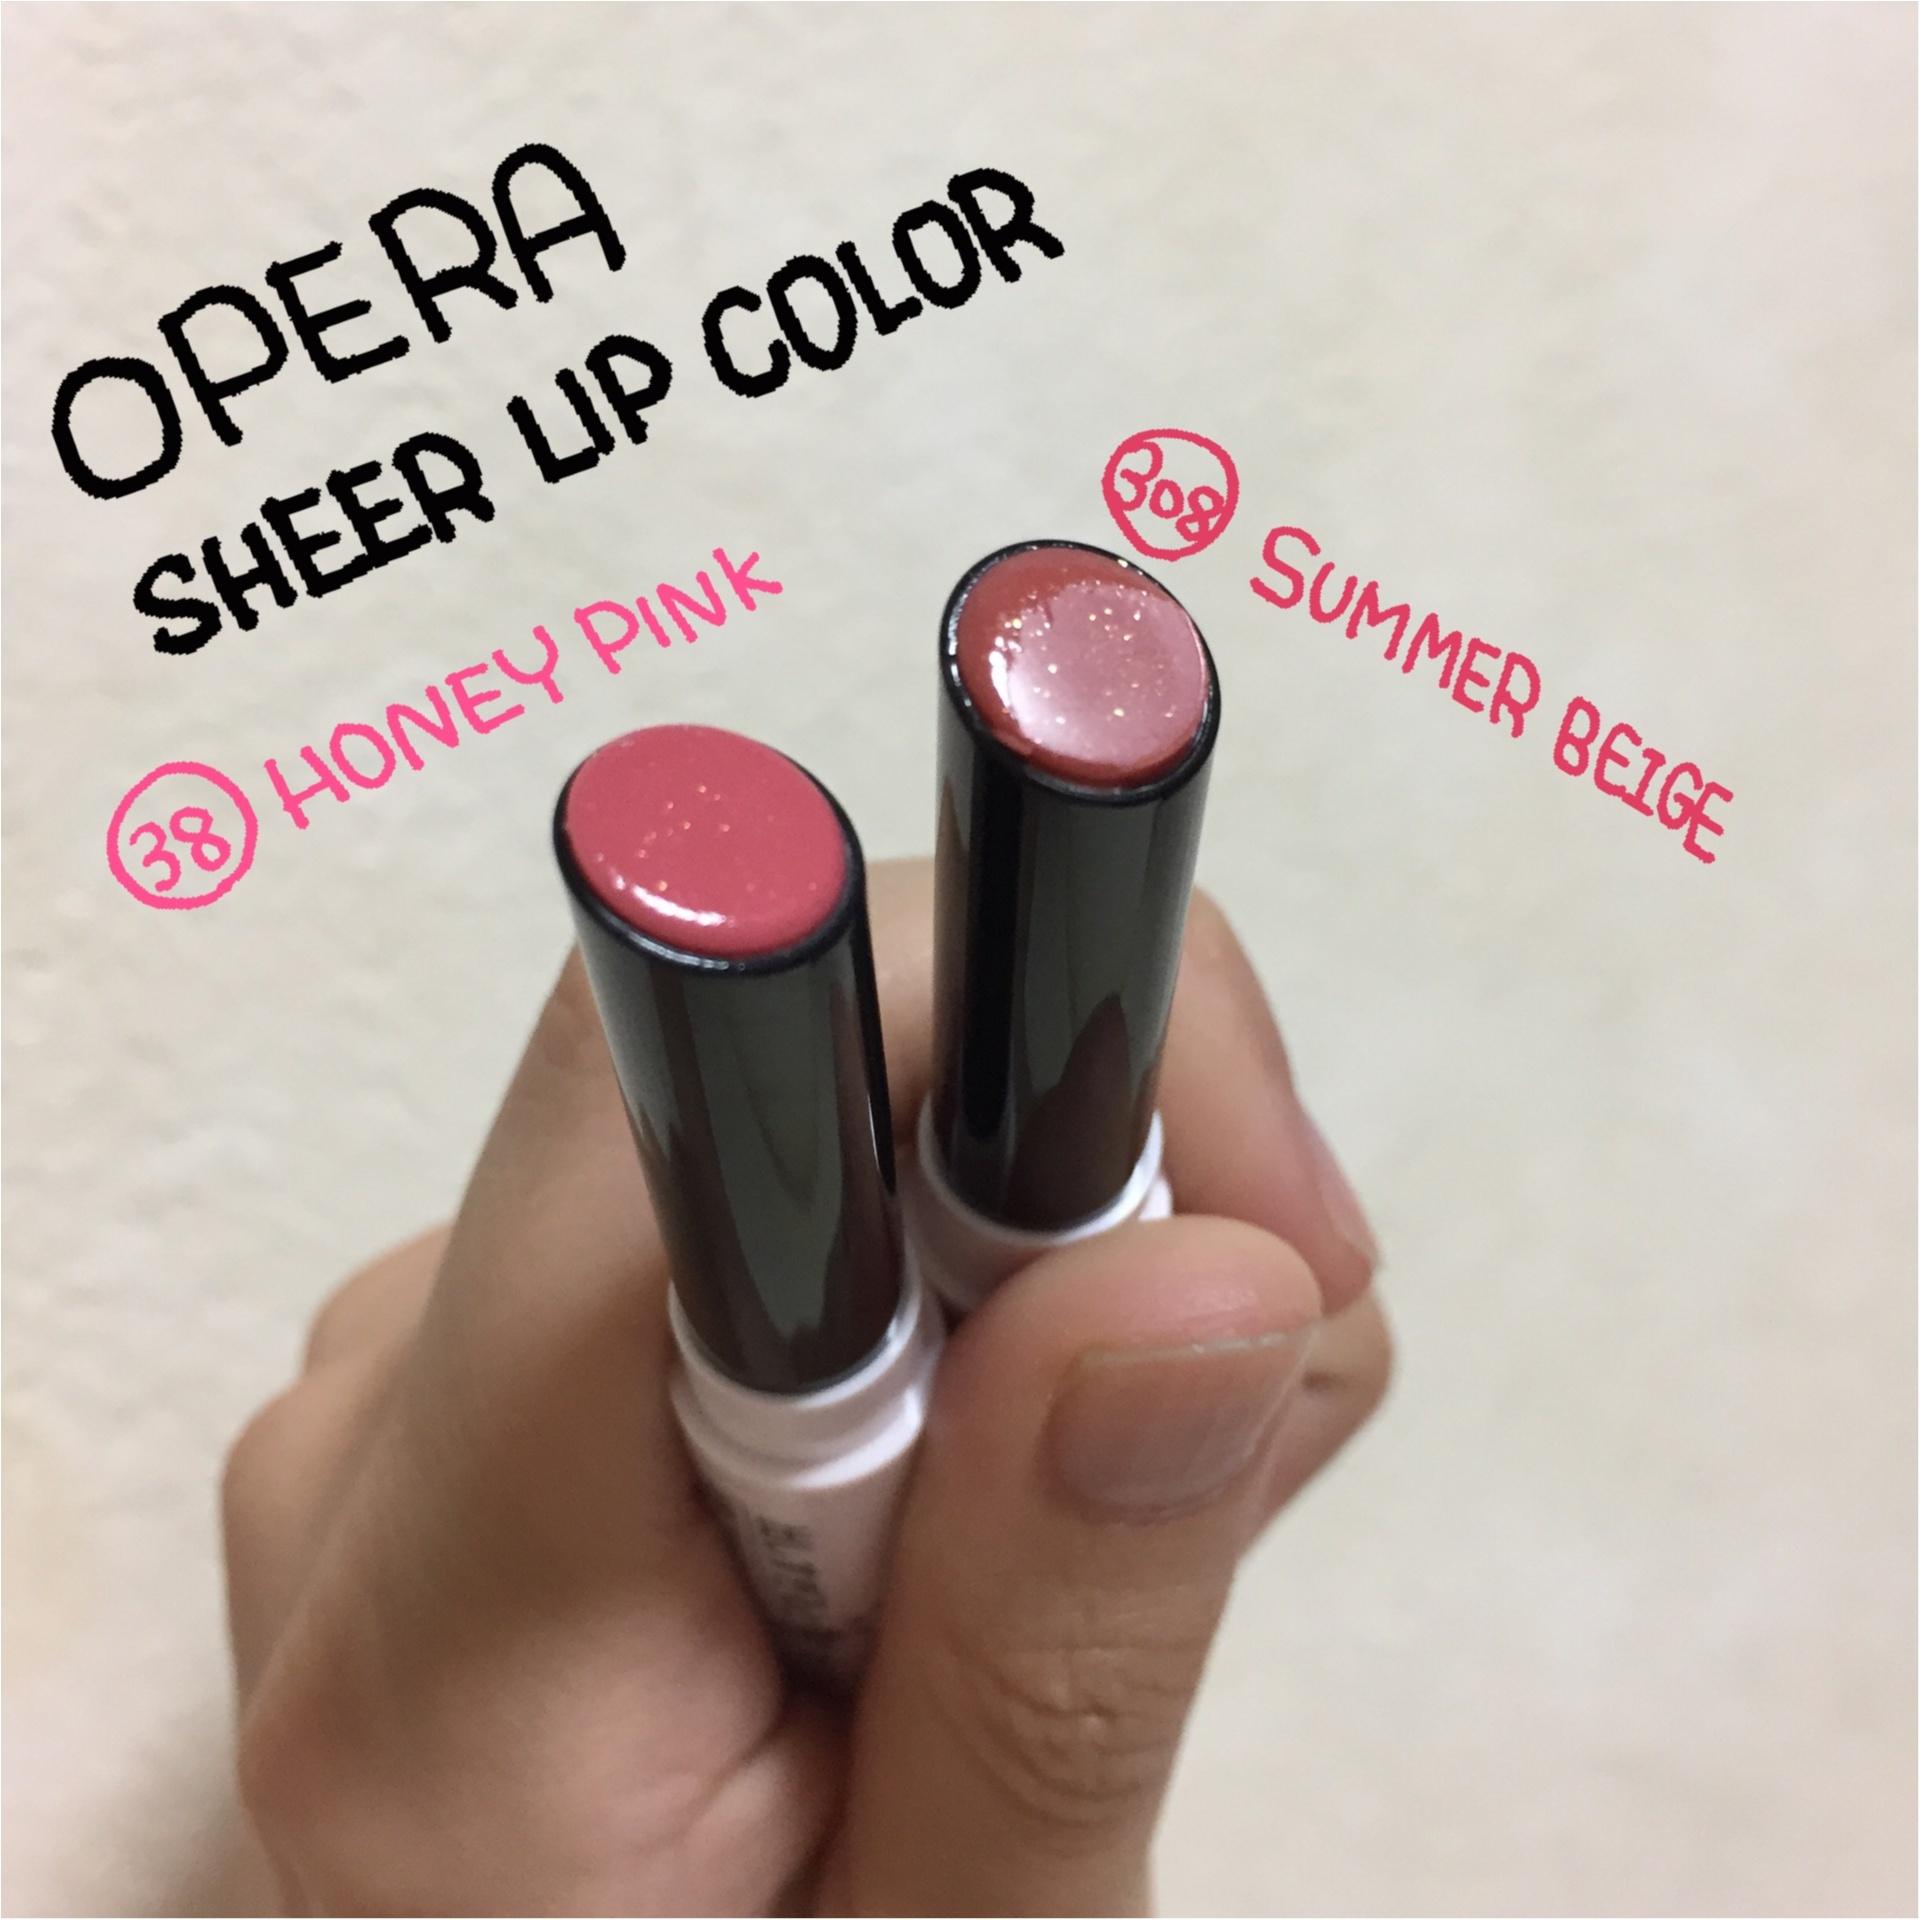 OPERA 今月の限定色を早速お試し*\(^o^)/*_1